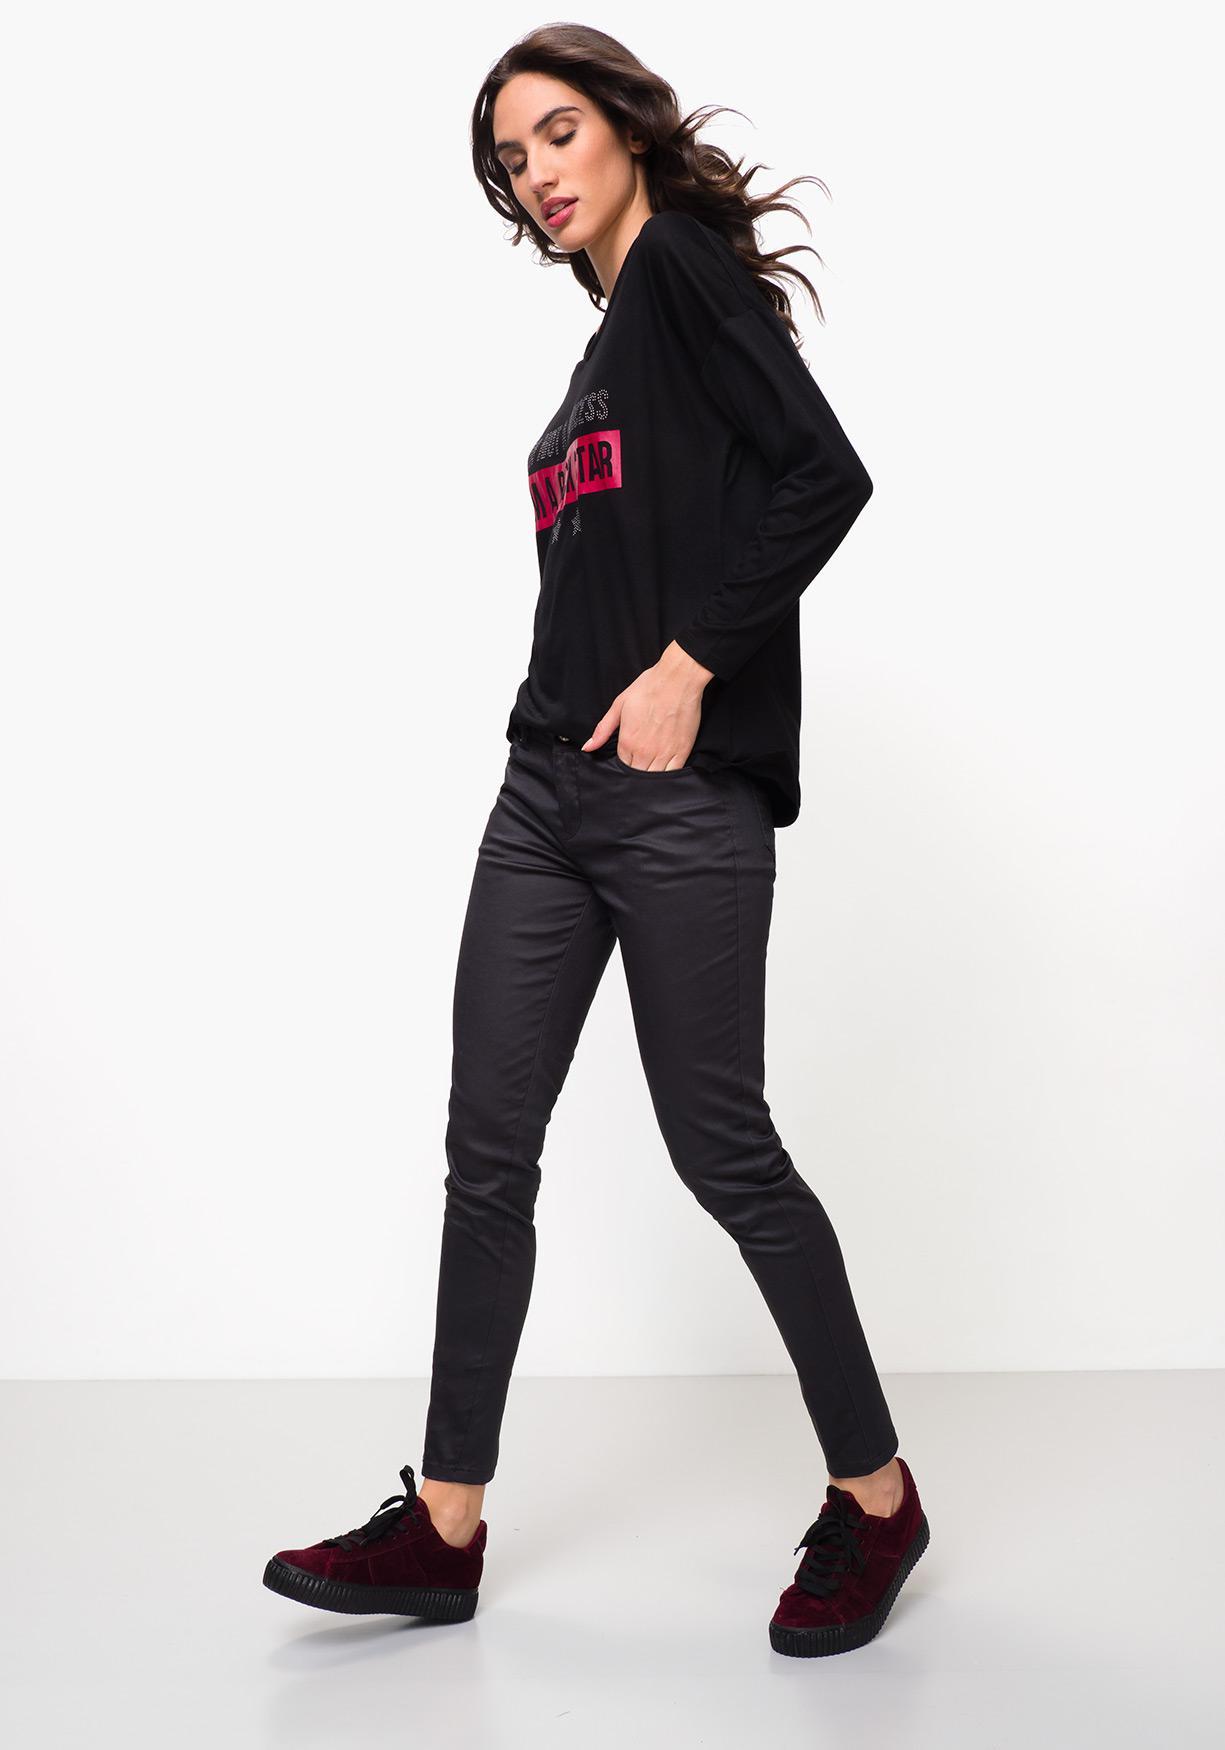 0badd372904 Mujer De Camiseta Larga Manga Comprar Tex ¡aprovéchate Nuestros UqxROnwp